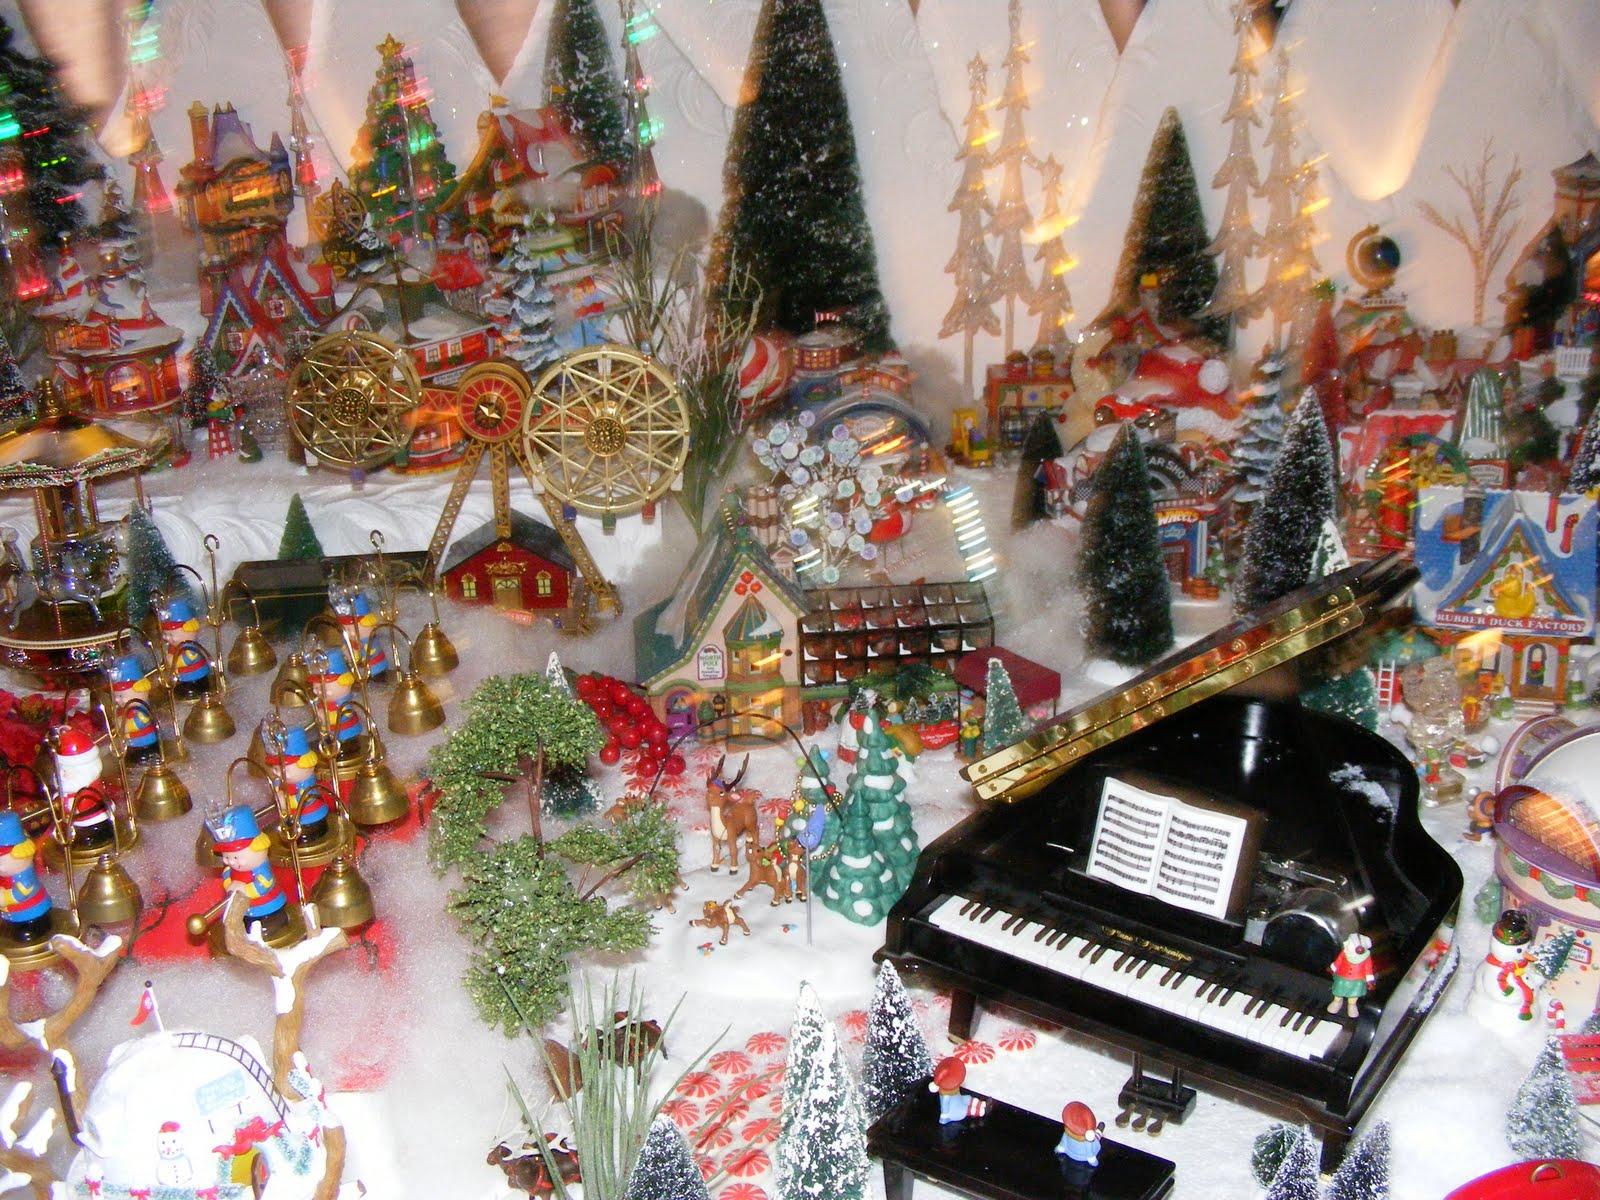 Department 56 Christmas Village Display.Christmas Village Fun Blog Kim Krum S North Pole Village